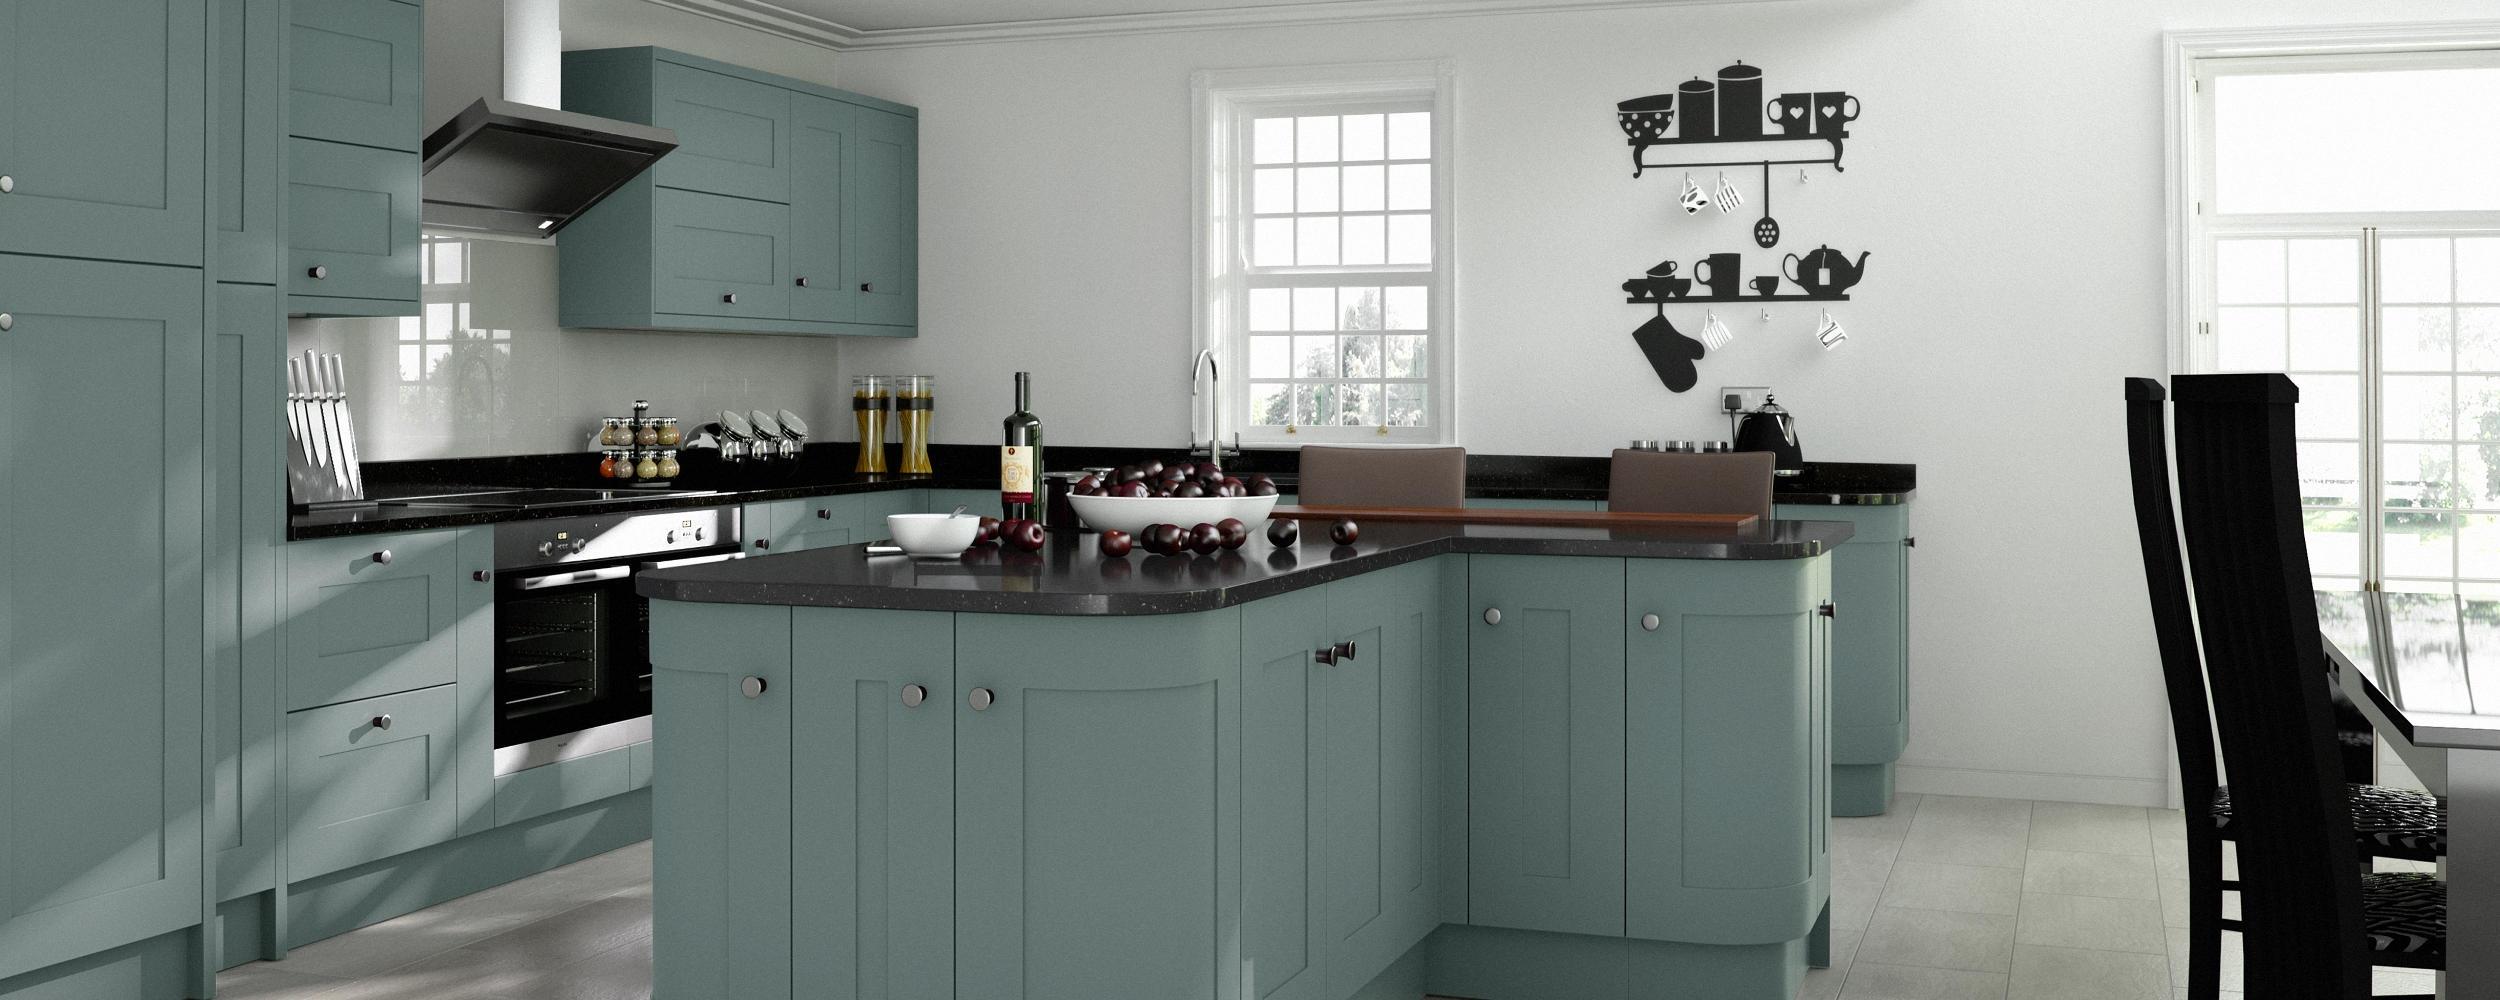 shaker-kitchen-design